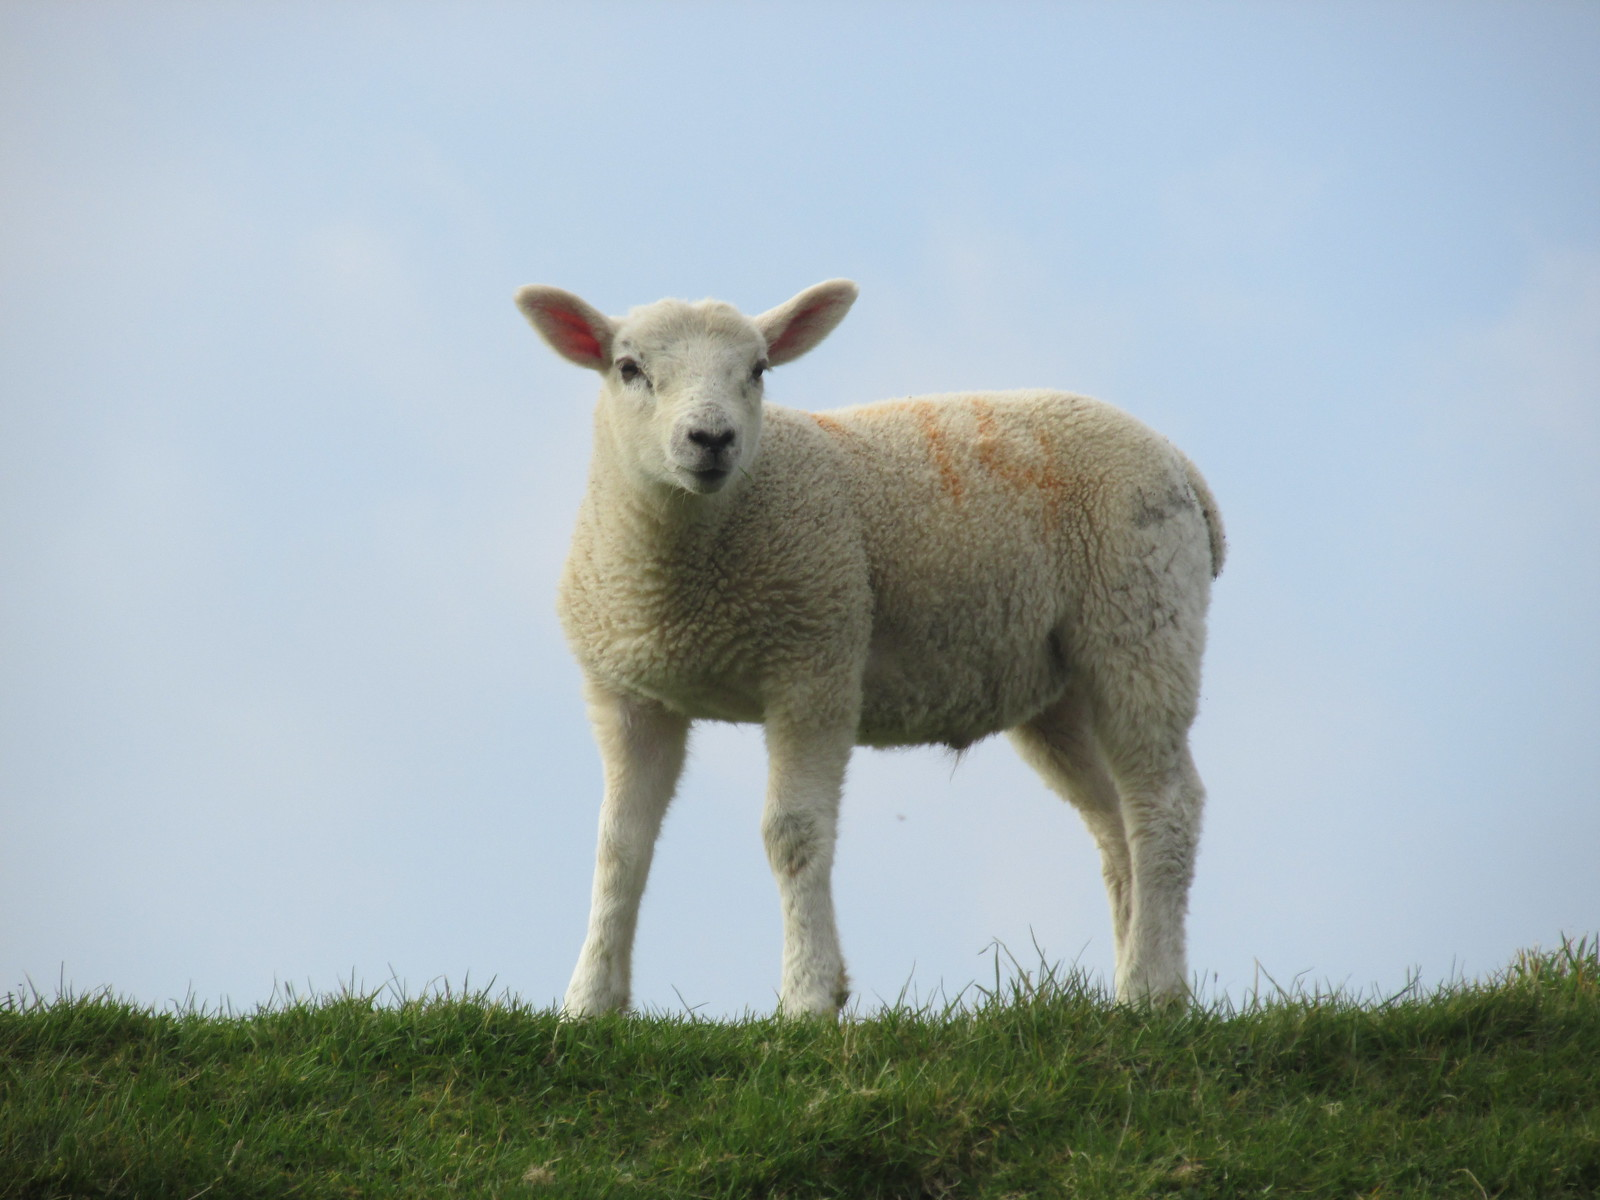 April 6, 2015: Glynde to Seaford Cuckmere Haven lamb